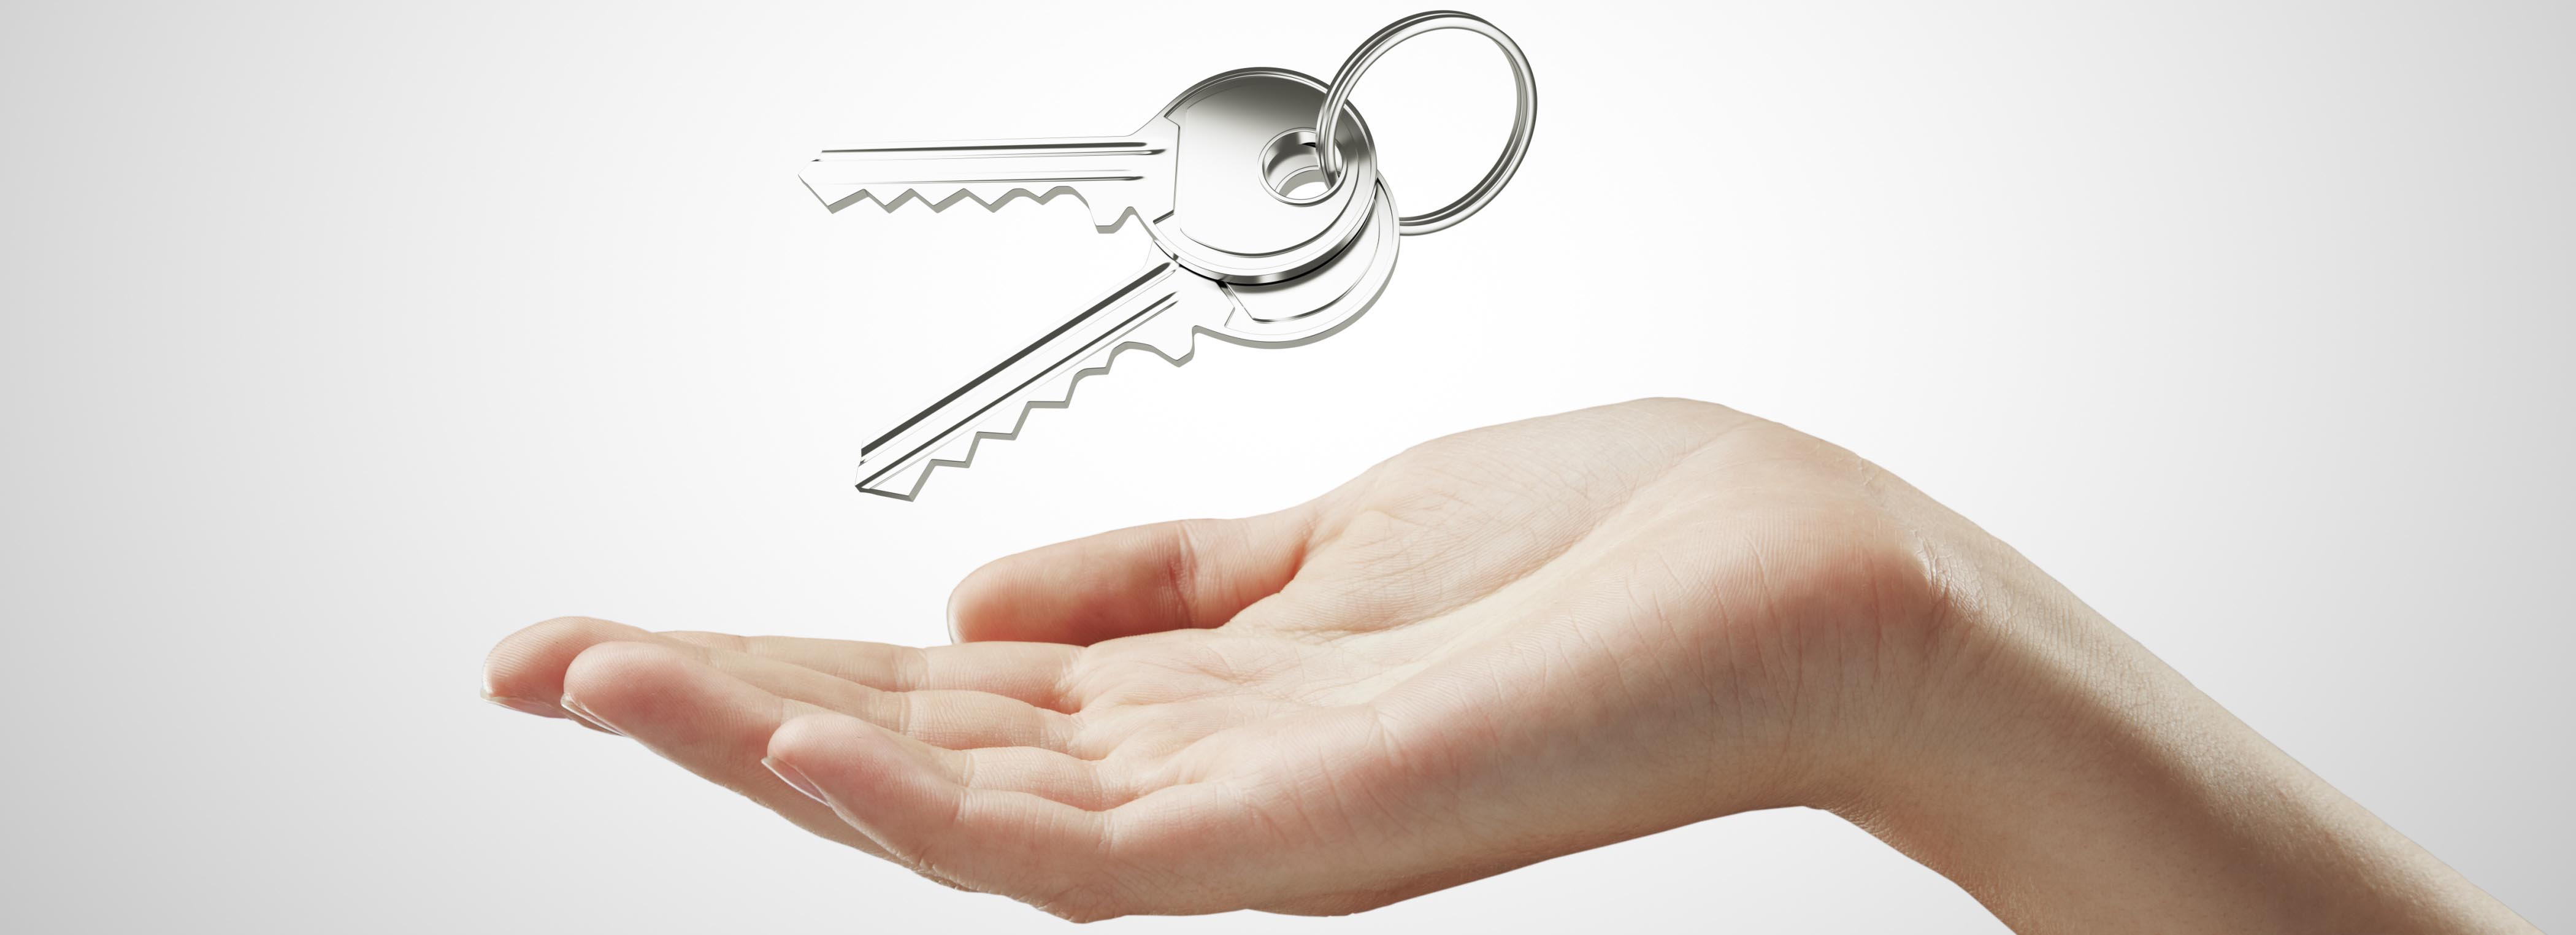 diagnostics immobiliers airbnb